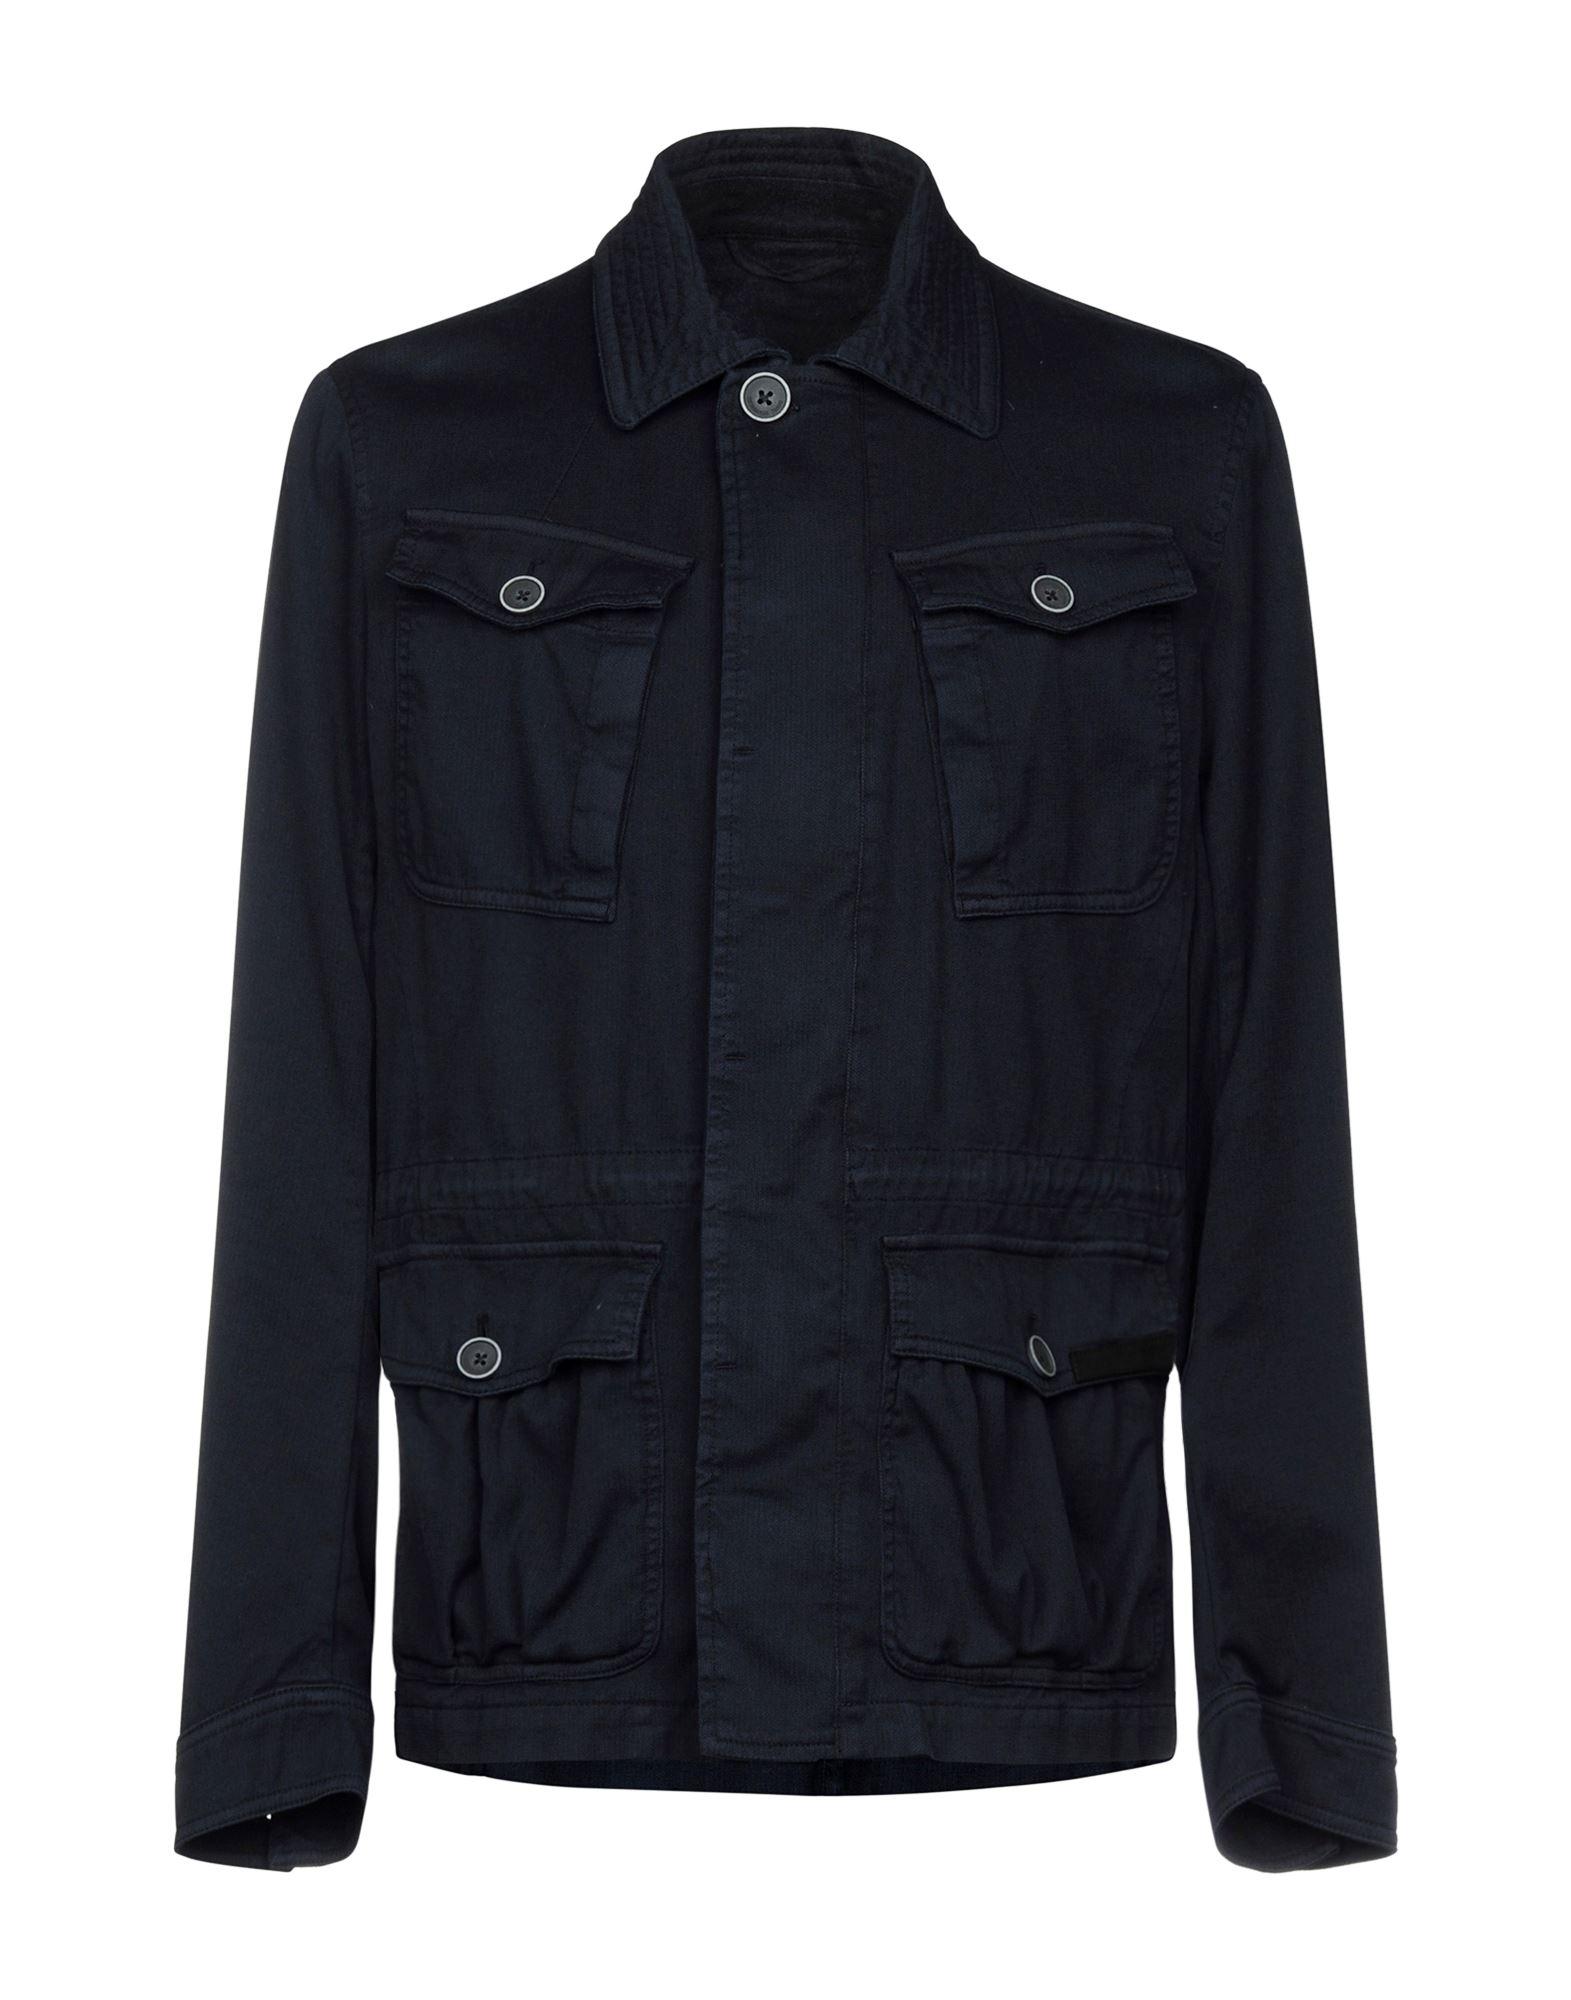 Giubbotto Trussardi Jeans Uomo - Acquista online su